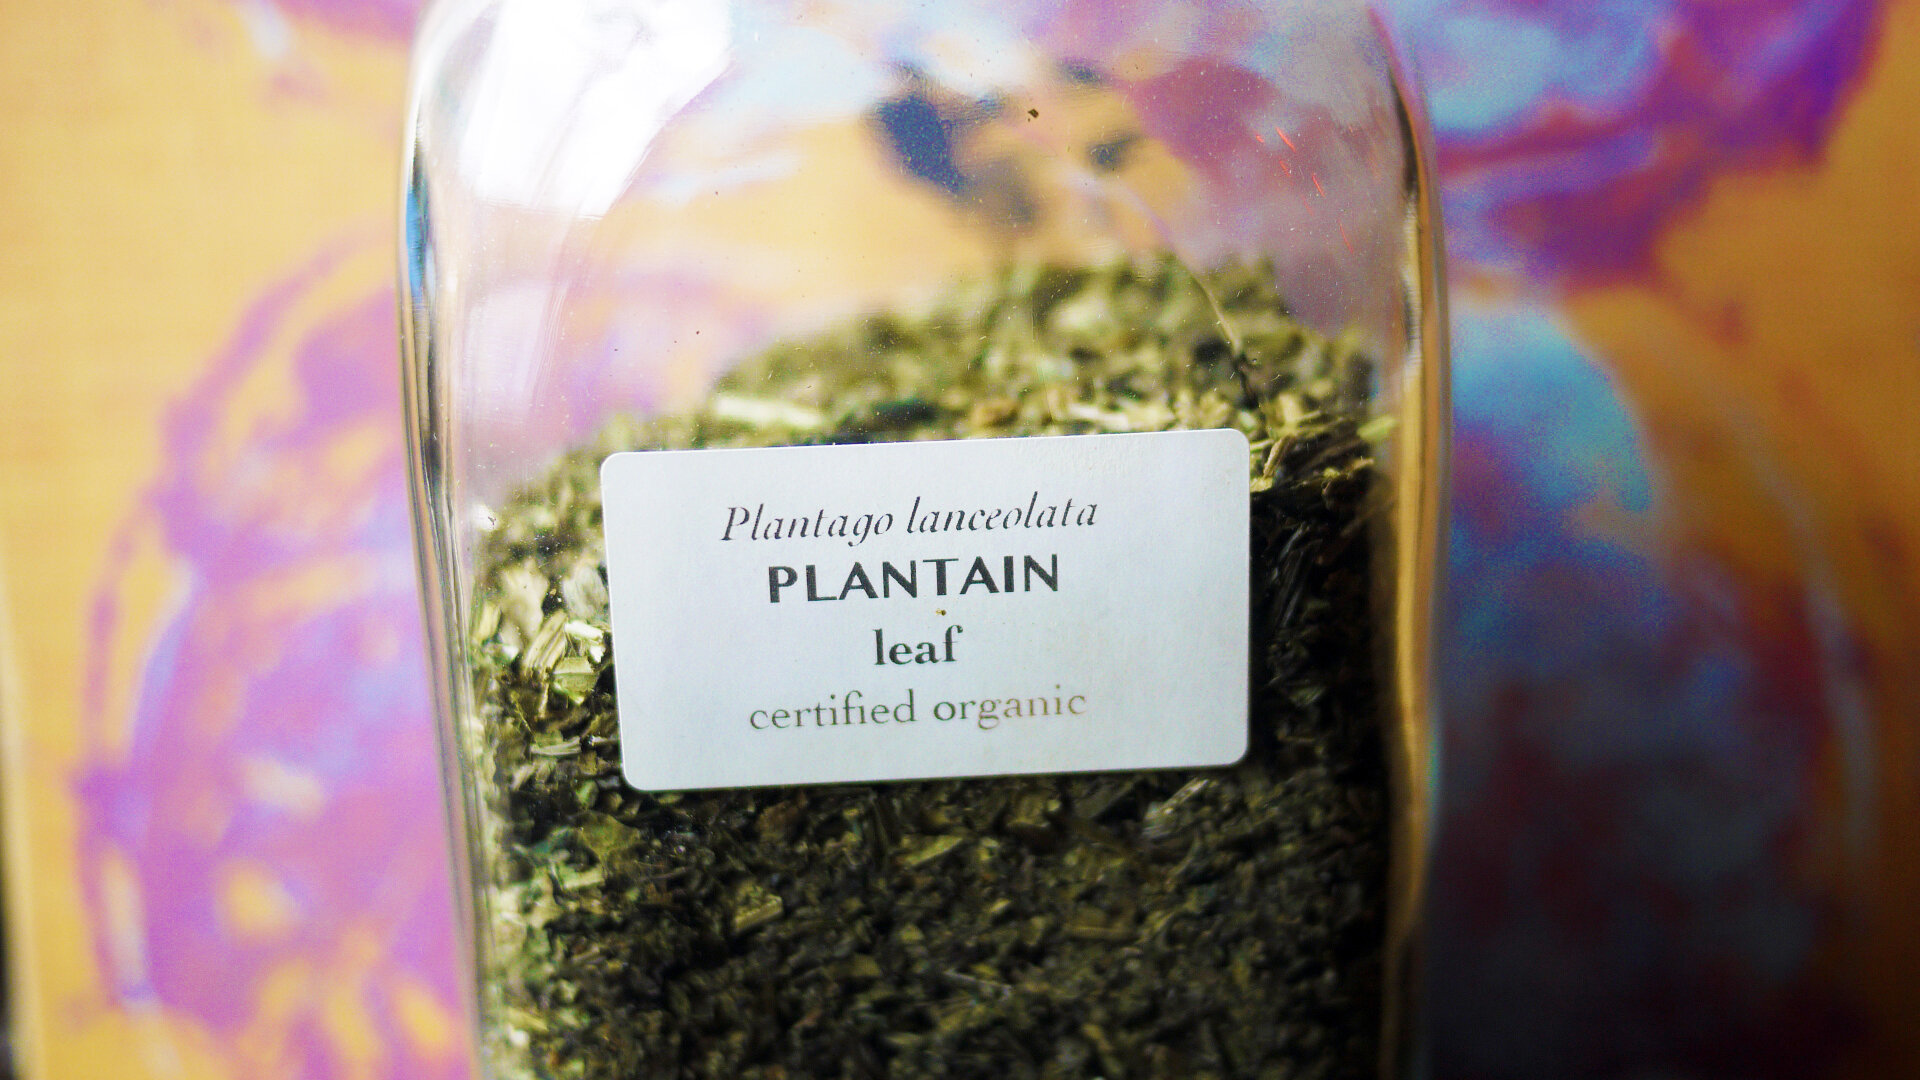 Plantainleaf.jpg